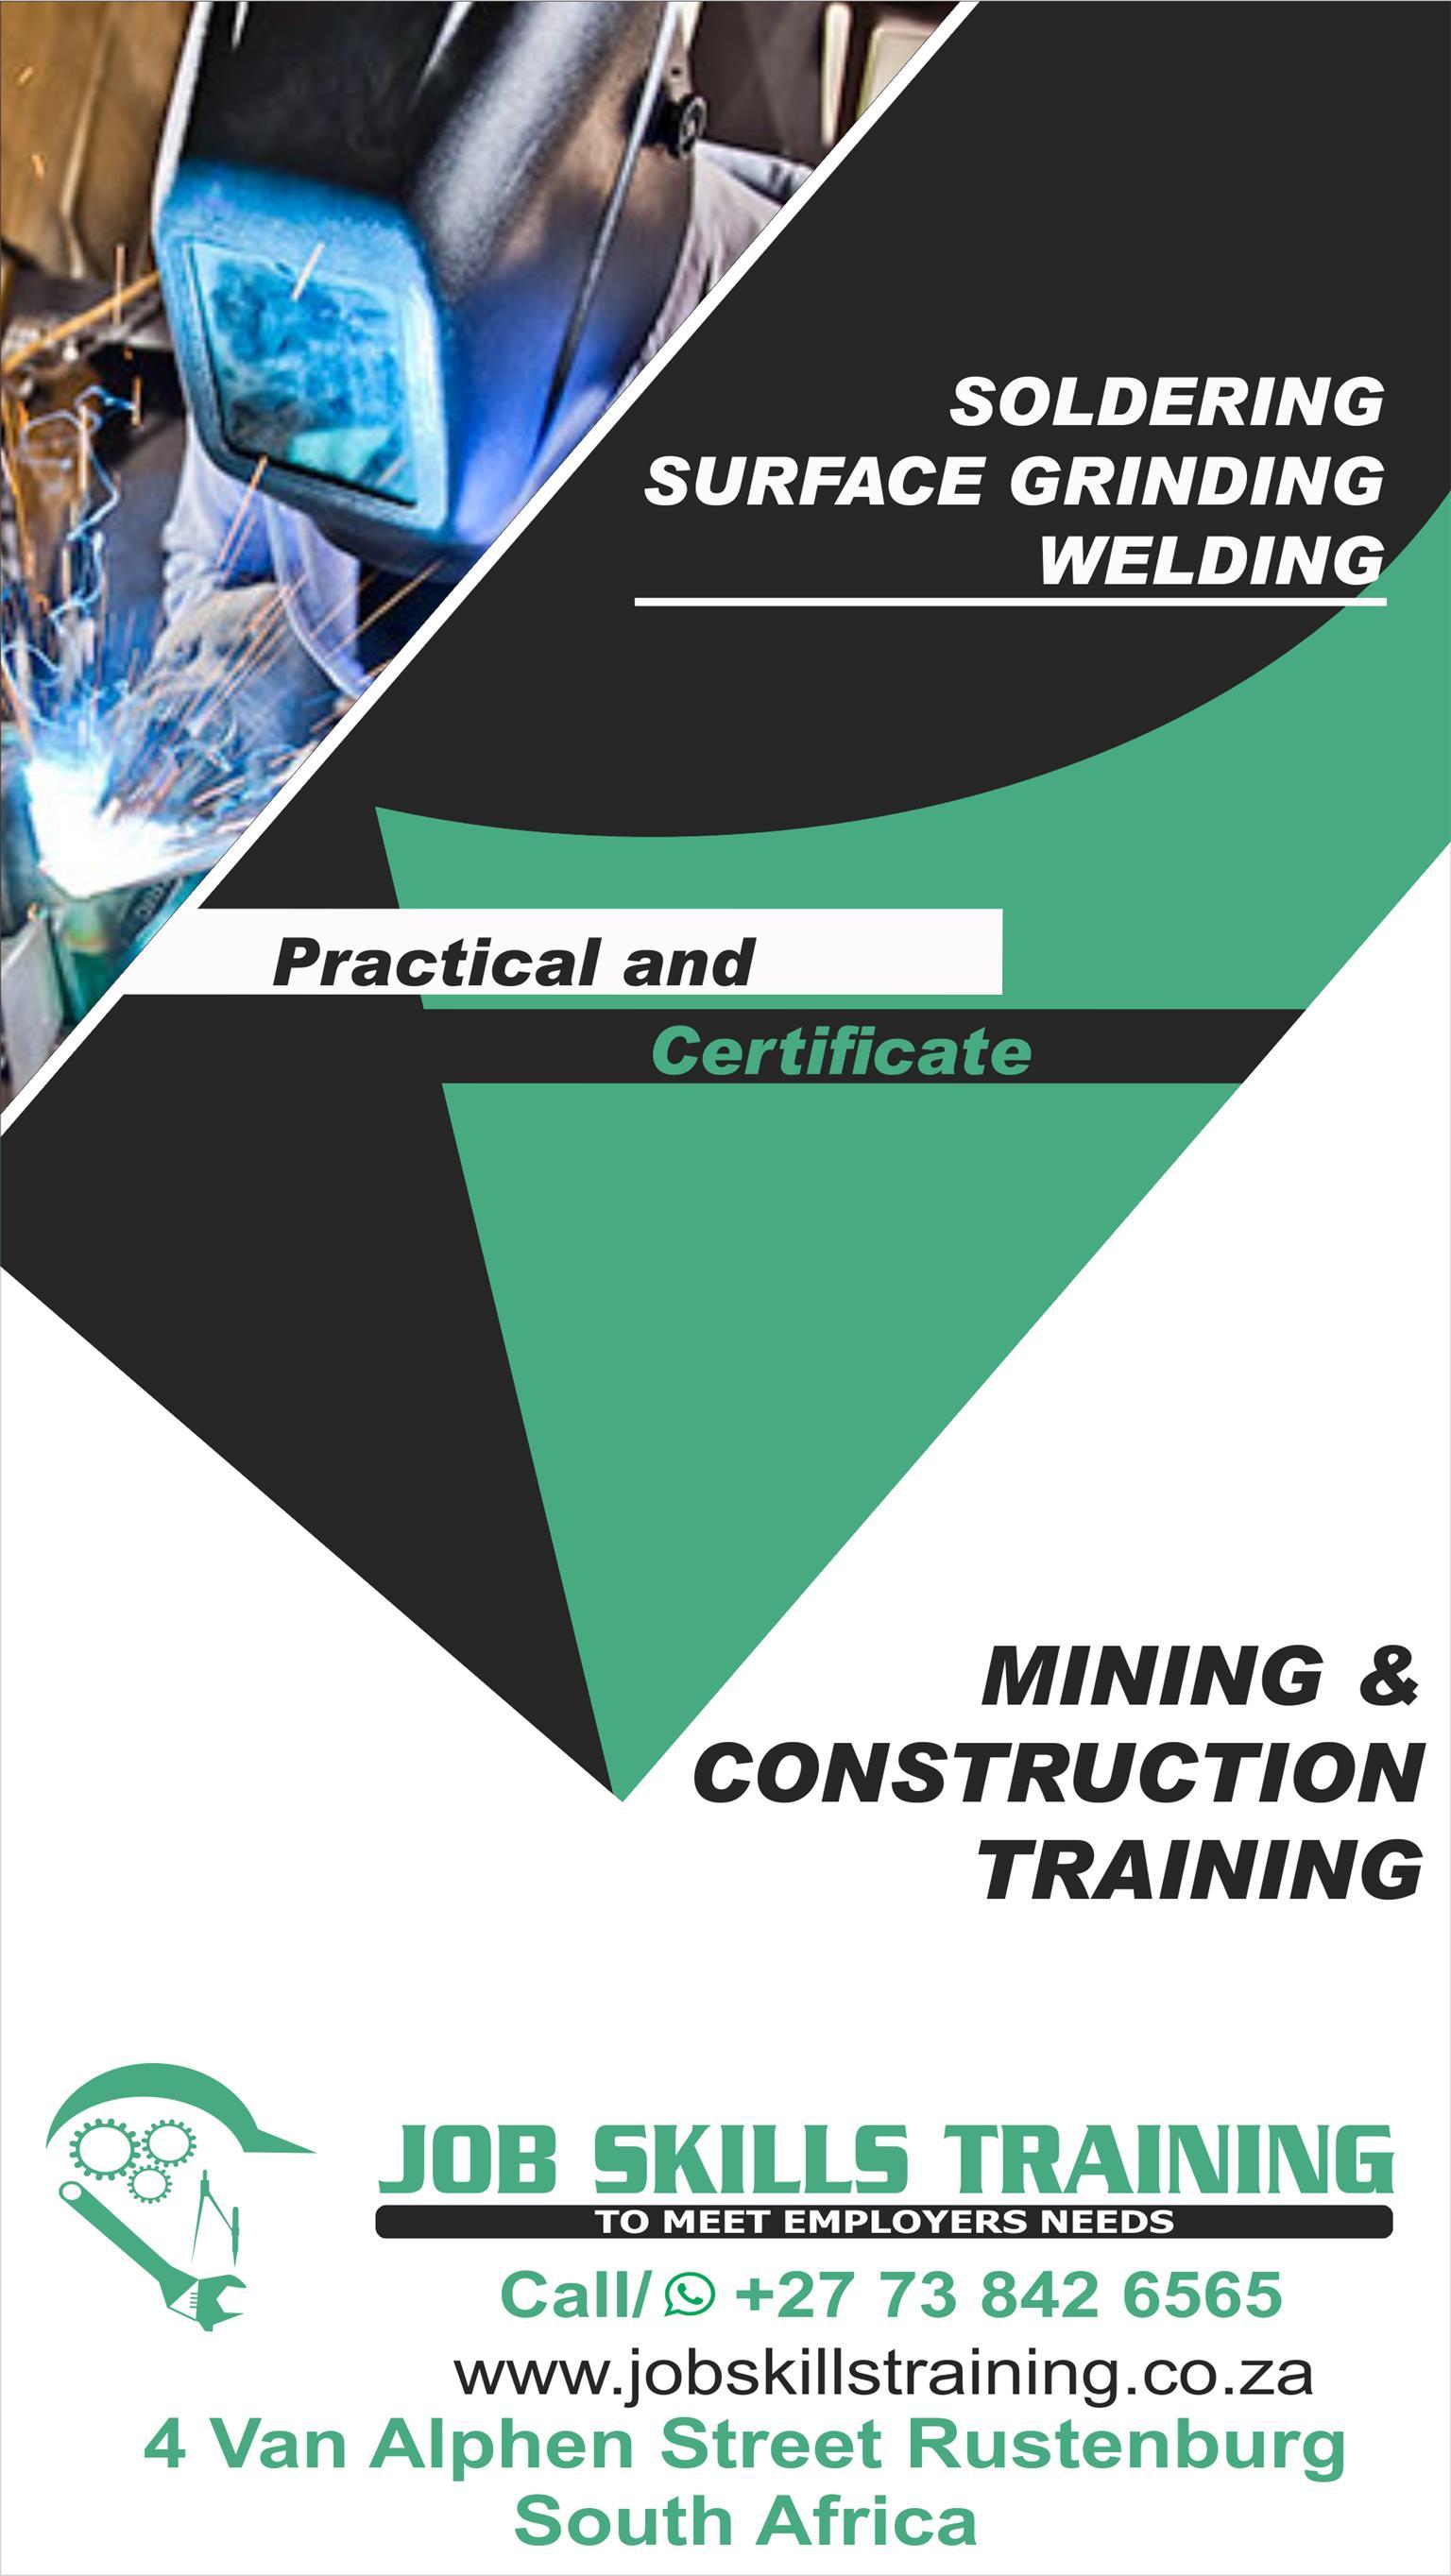 Welding Training Certificate License Call 27 73 842 6565